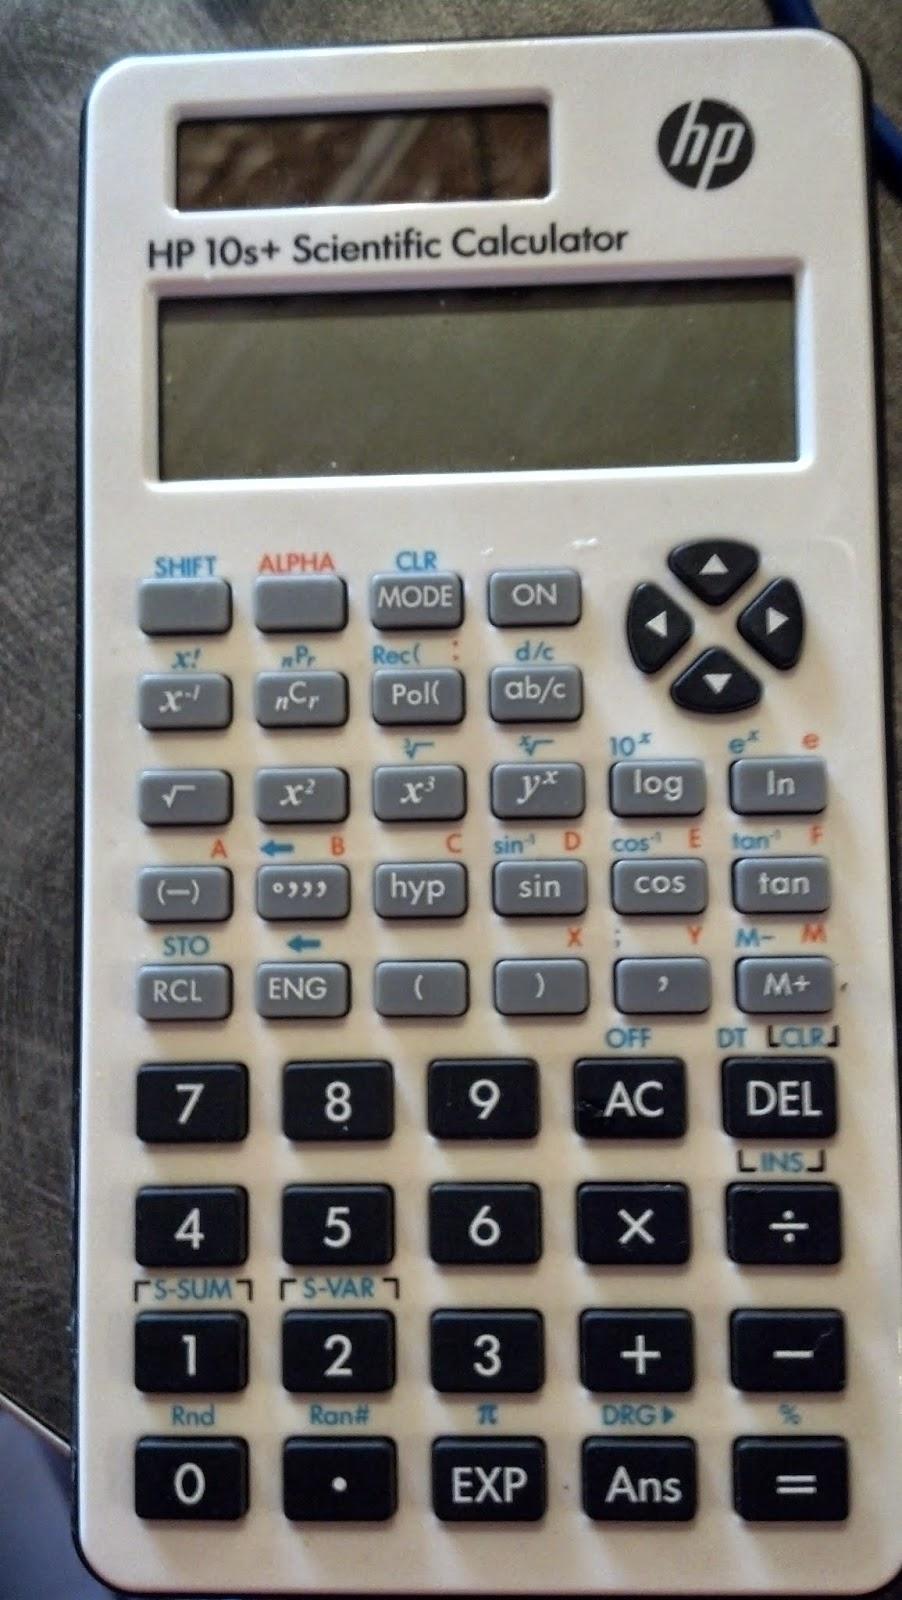 Eddie's Math and Calculator Blog: Caliber Scientific Calculator by